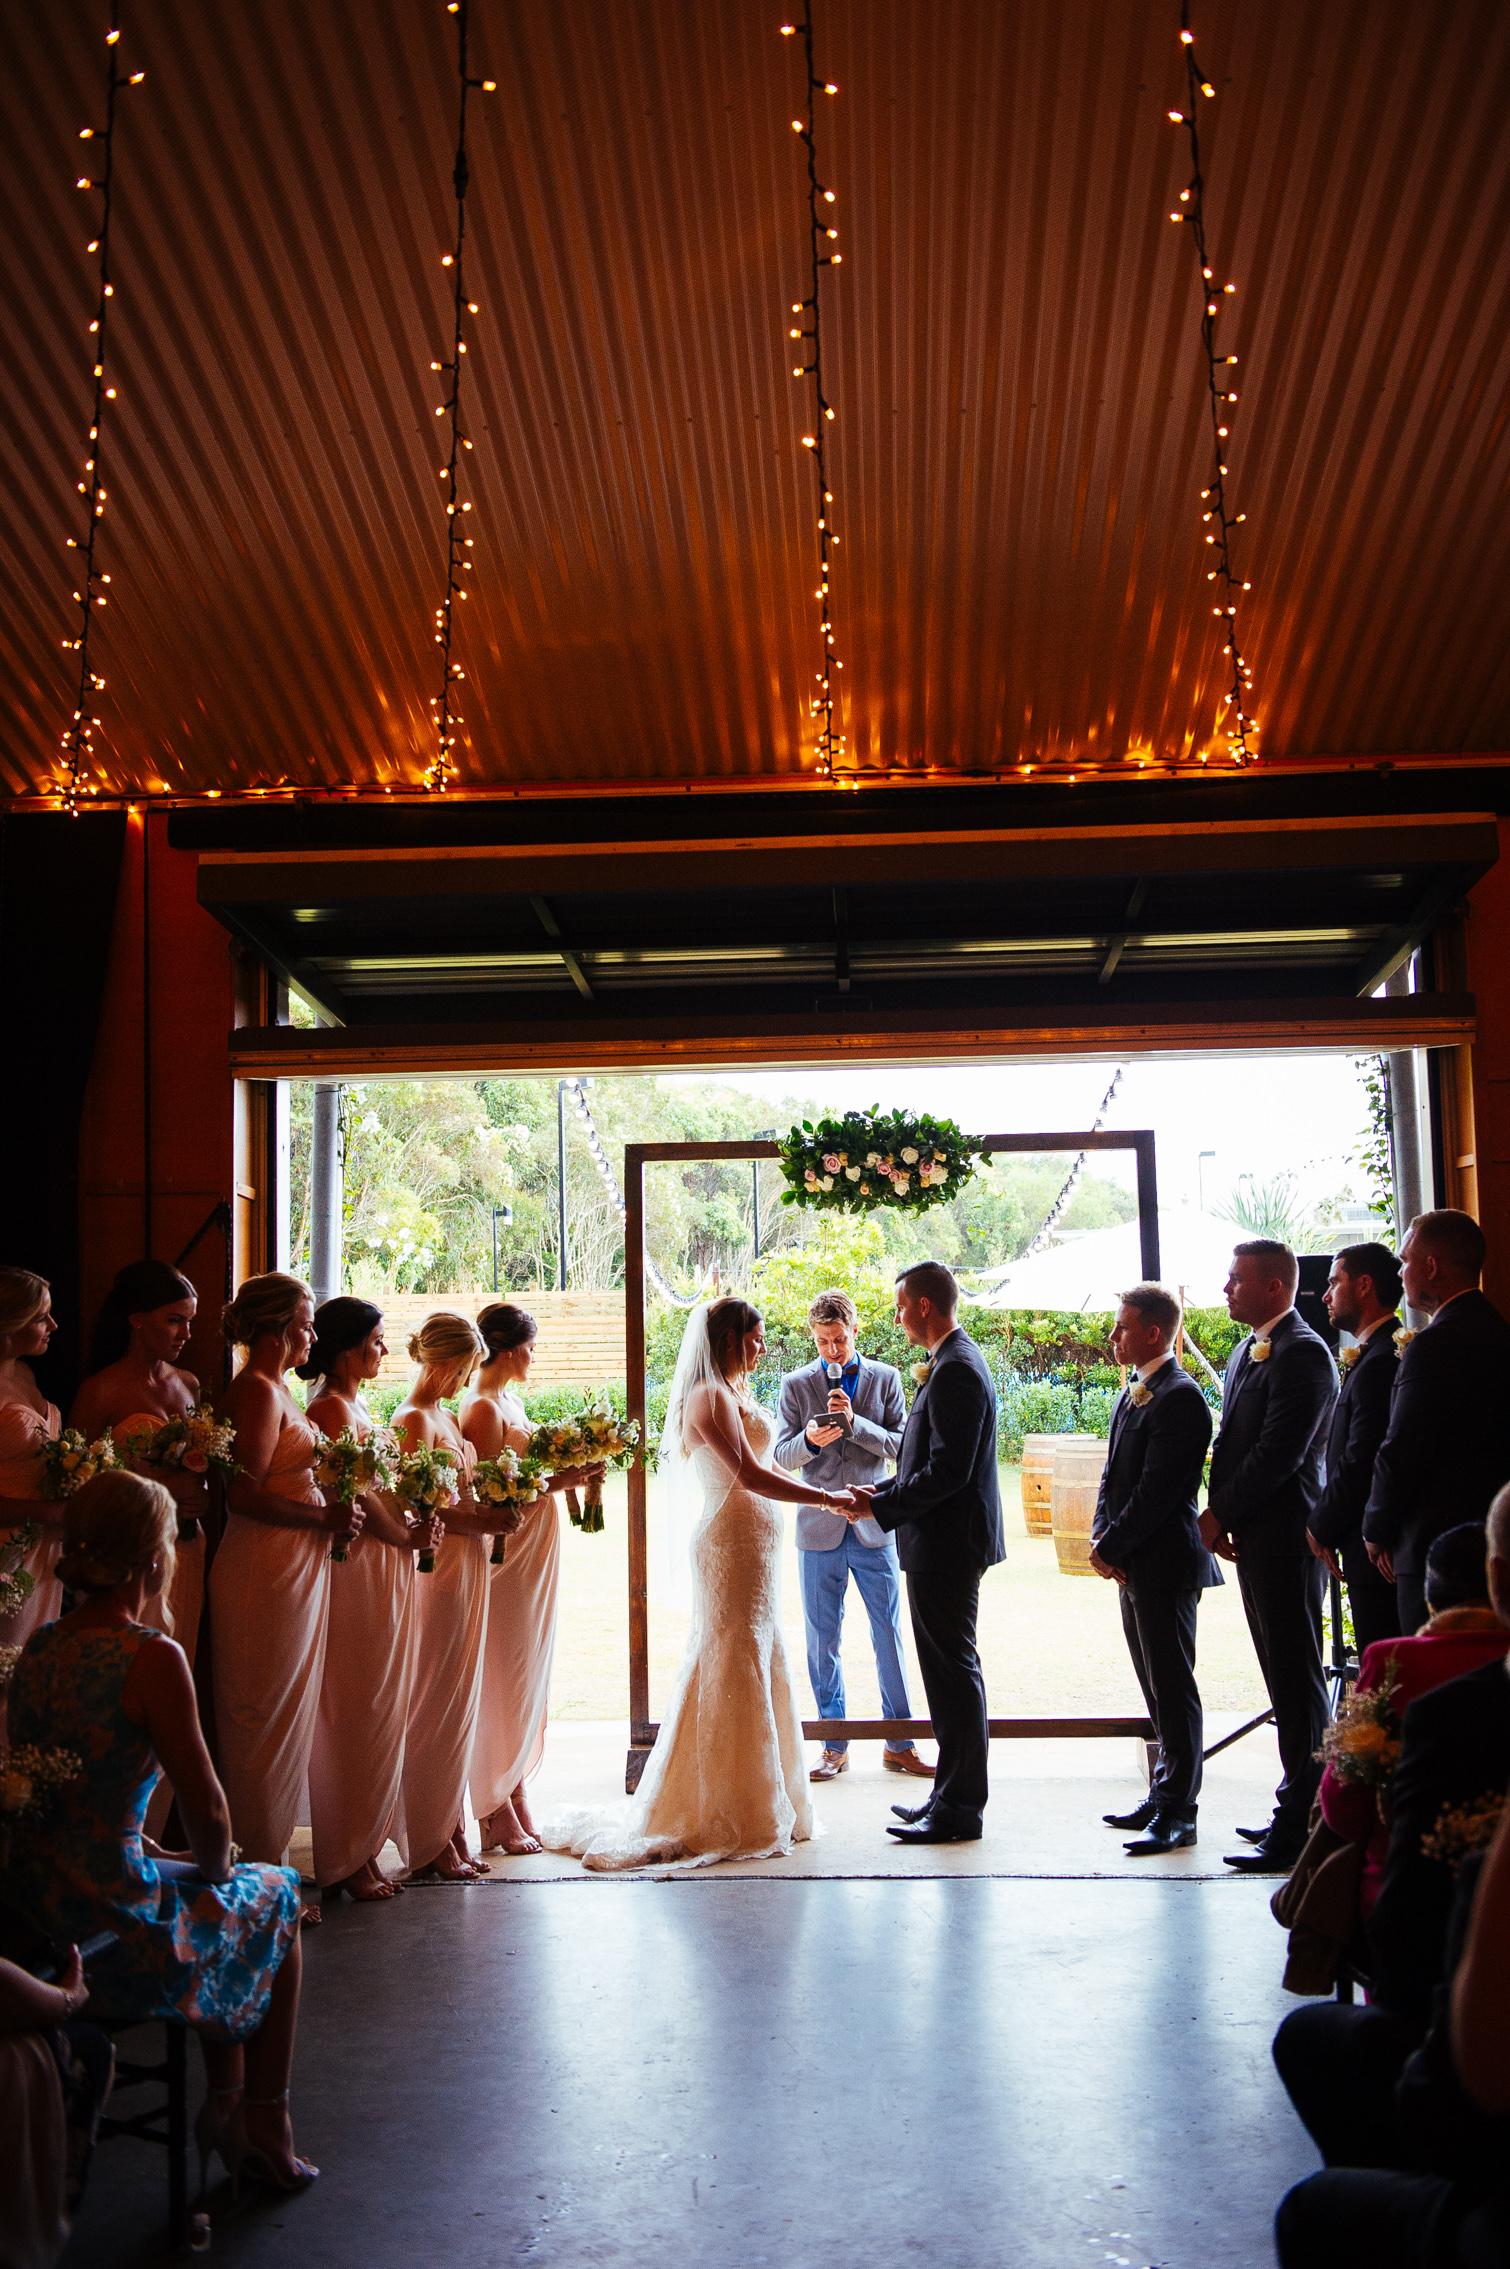 Kingscliffe_male_wedding_celebrant-Benjamin_Carlyle -6.jpg